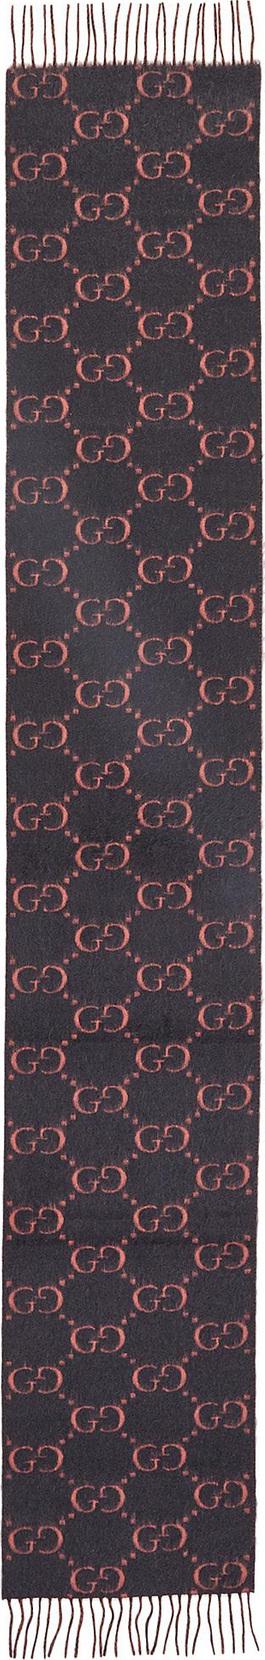 Gucci Reversible GG logo jacquard alpaca-wool scarf